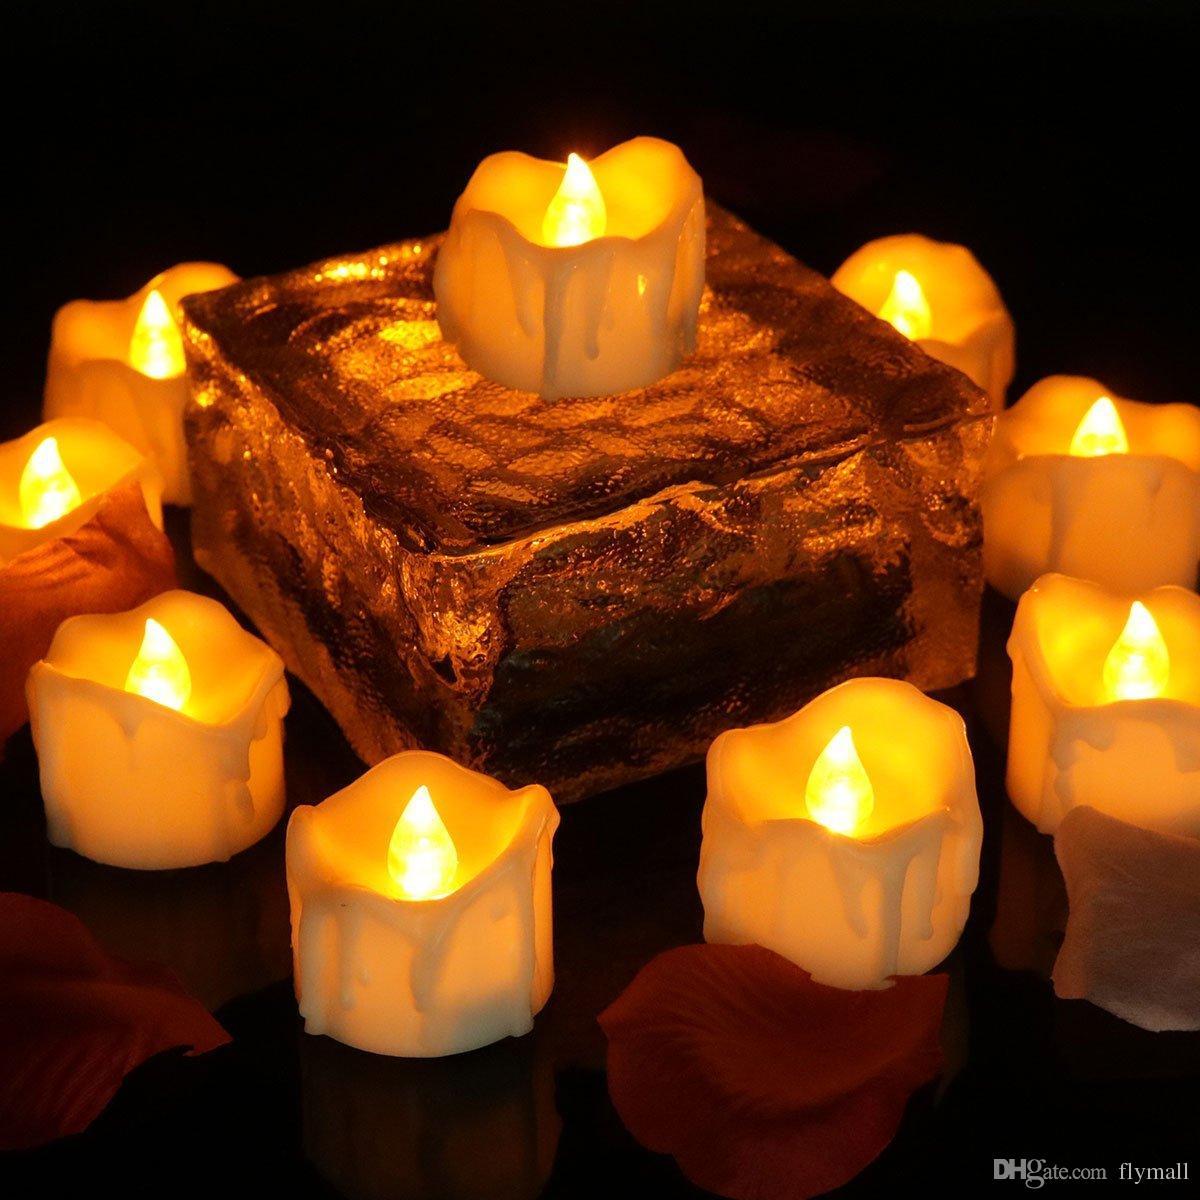 Cálido blanco parpadeante velas sin llama con temporizador Navidad banquete de boda Luz de vela con pilas Luces de té Velas electrónicas